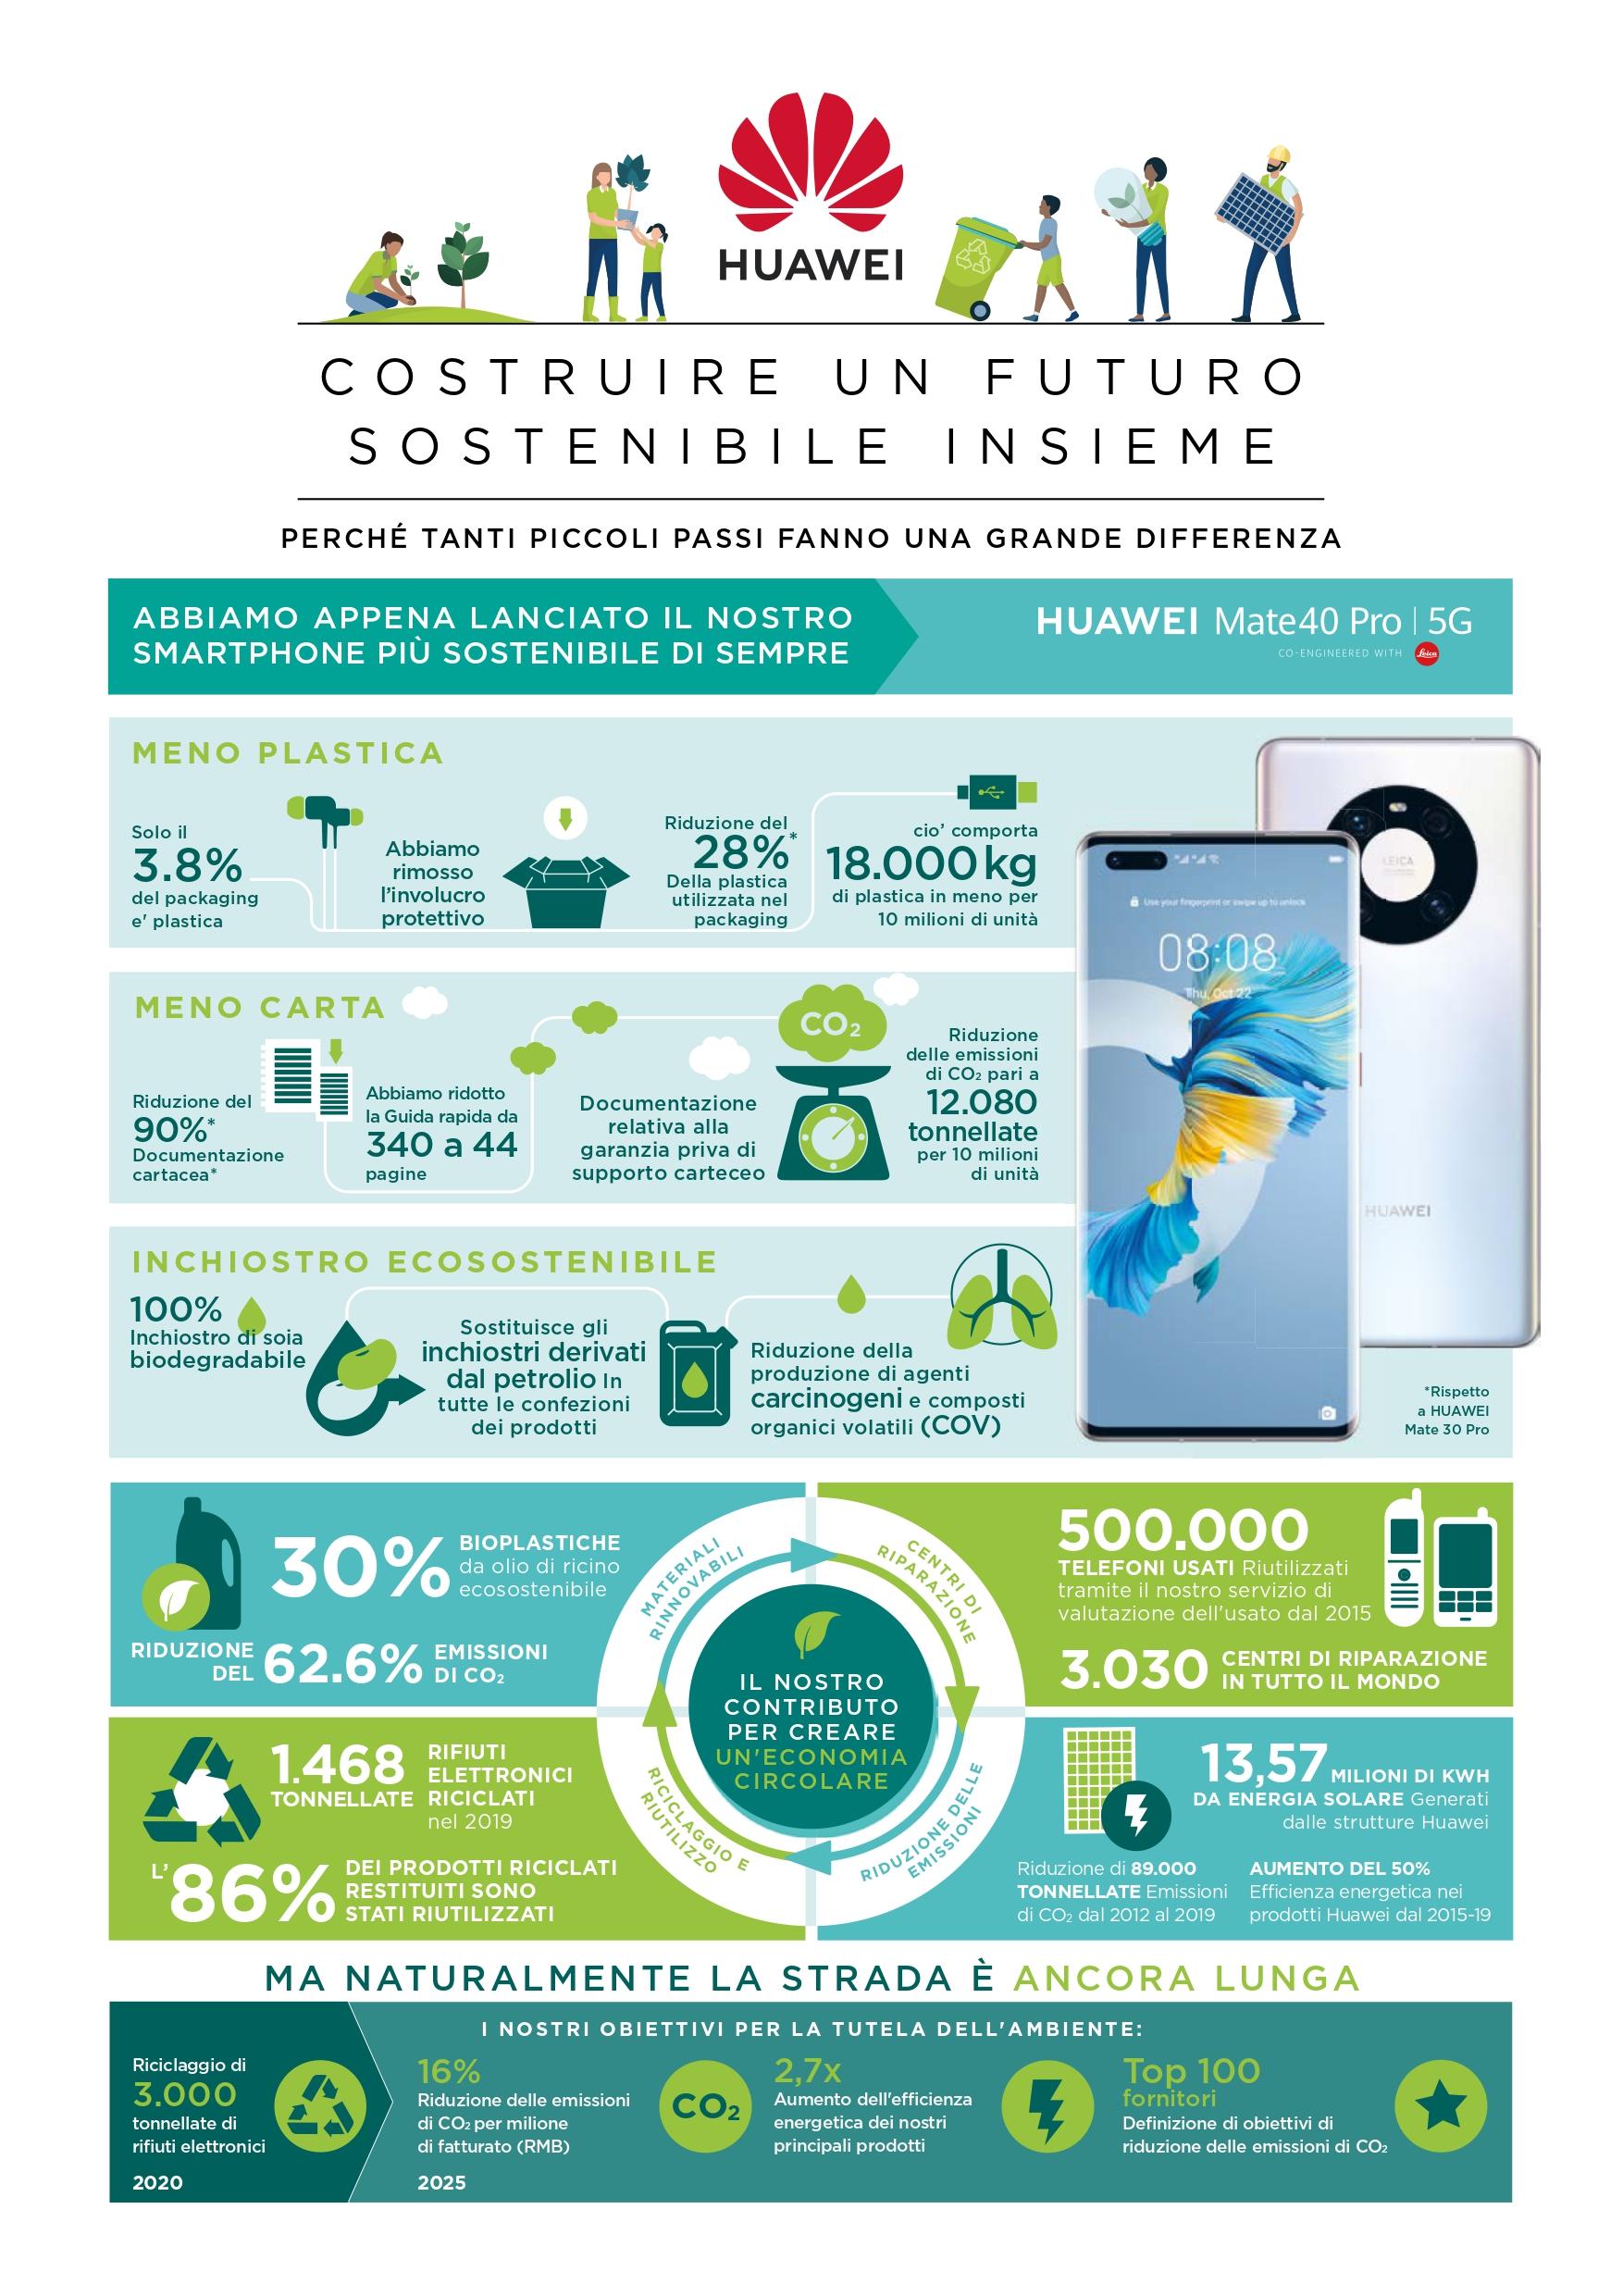 Huawei per l'ambiente